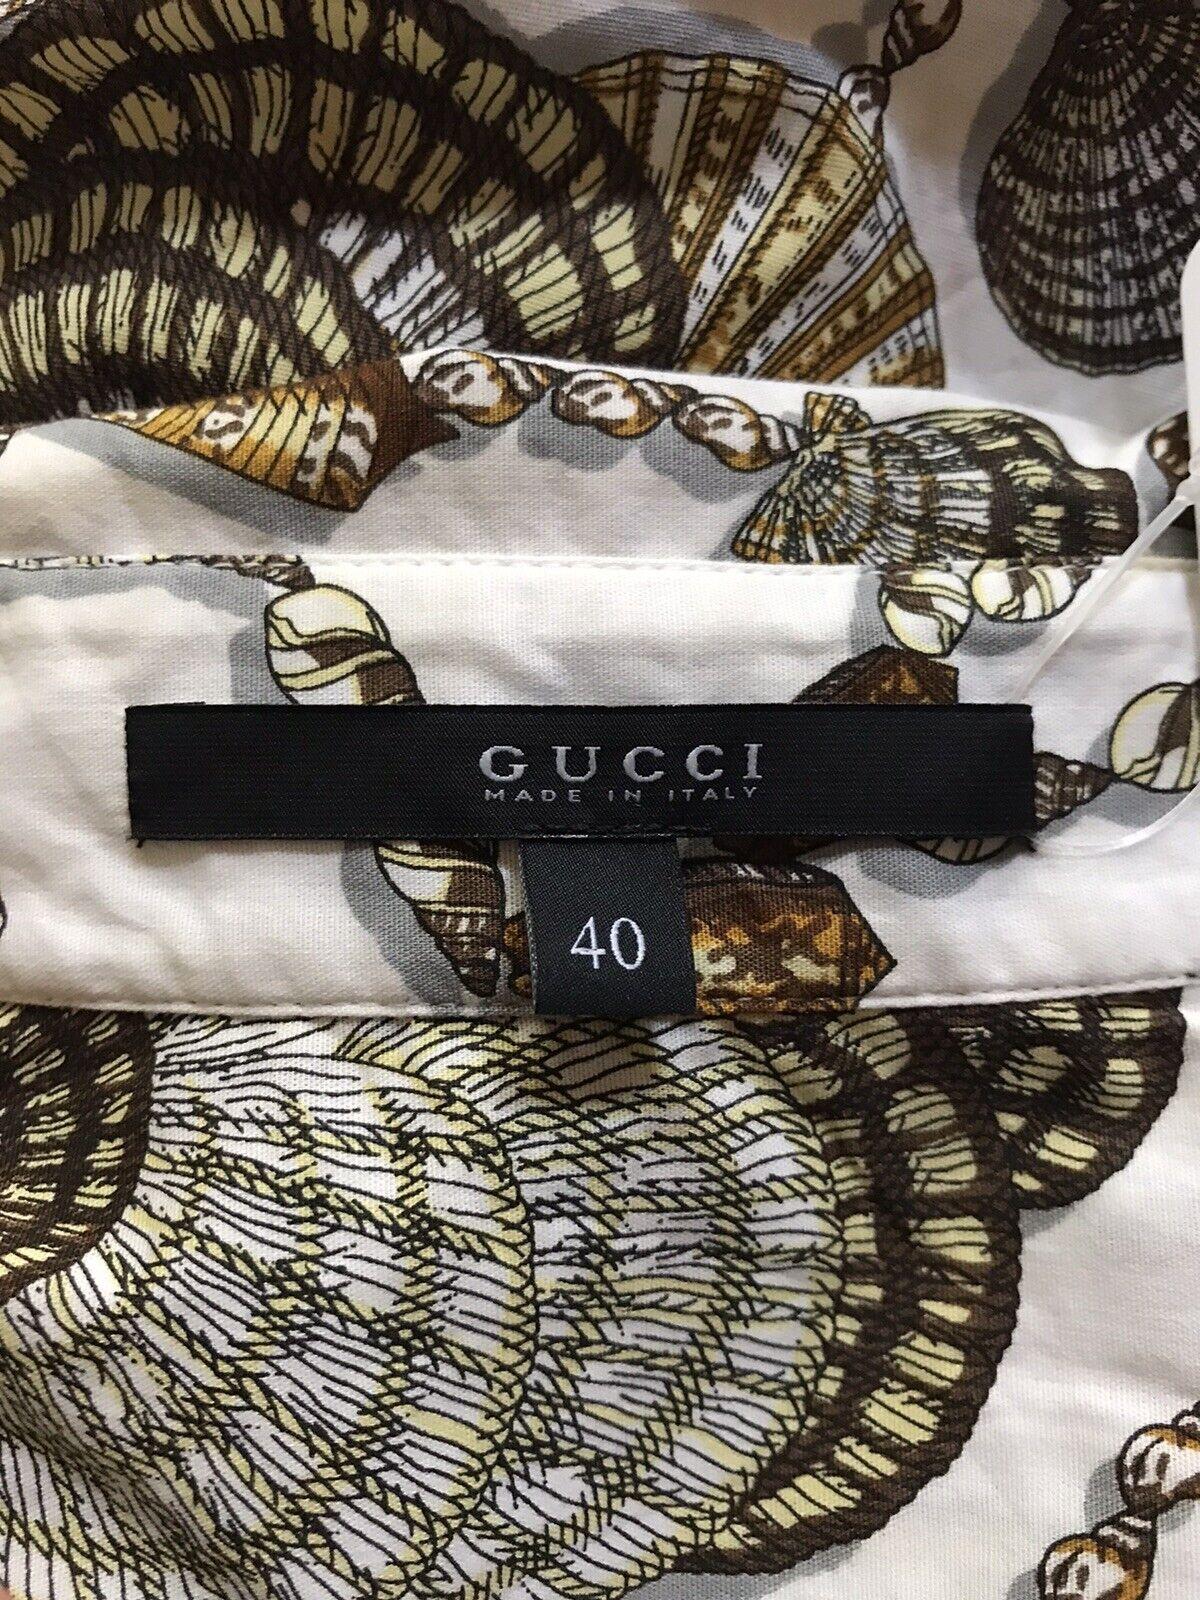 Rare Vtg Gucci White Seashell Print Top S - image 8